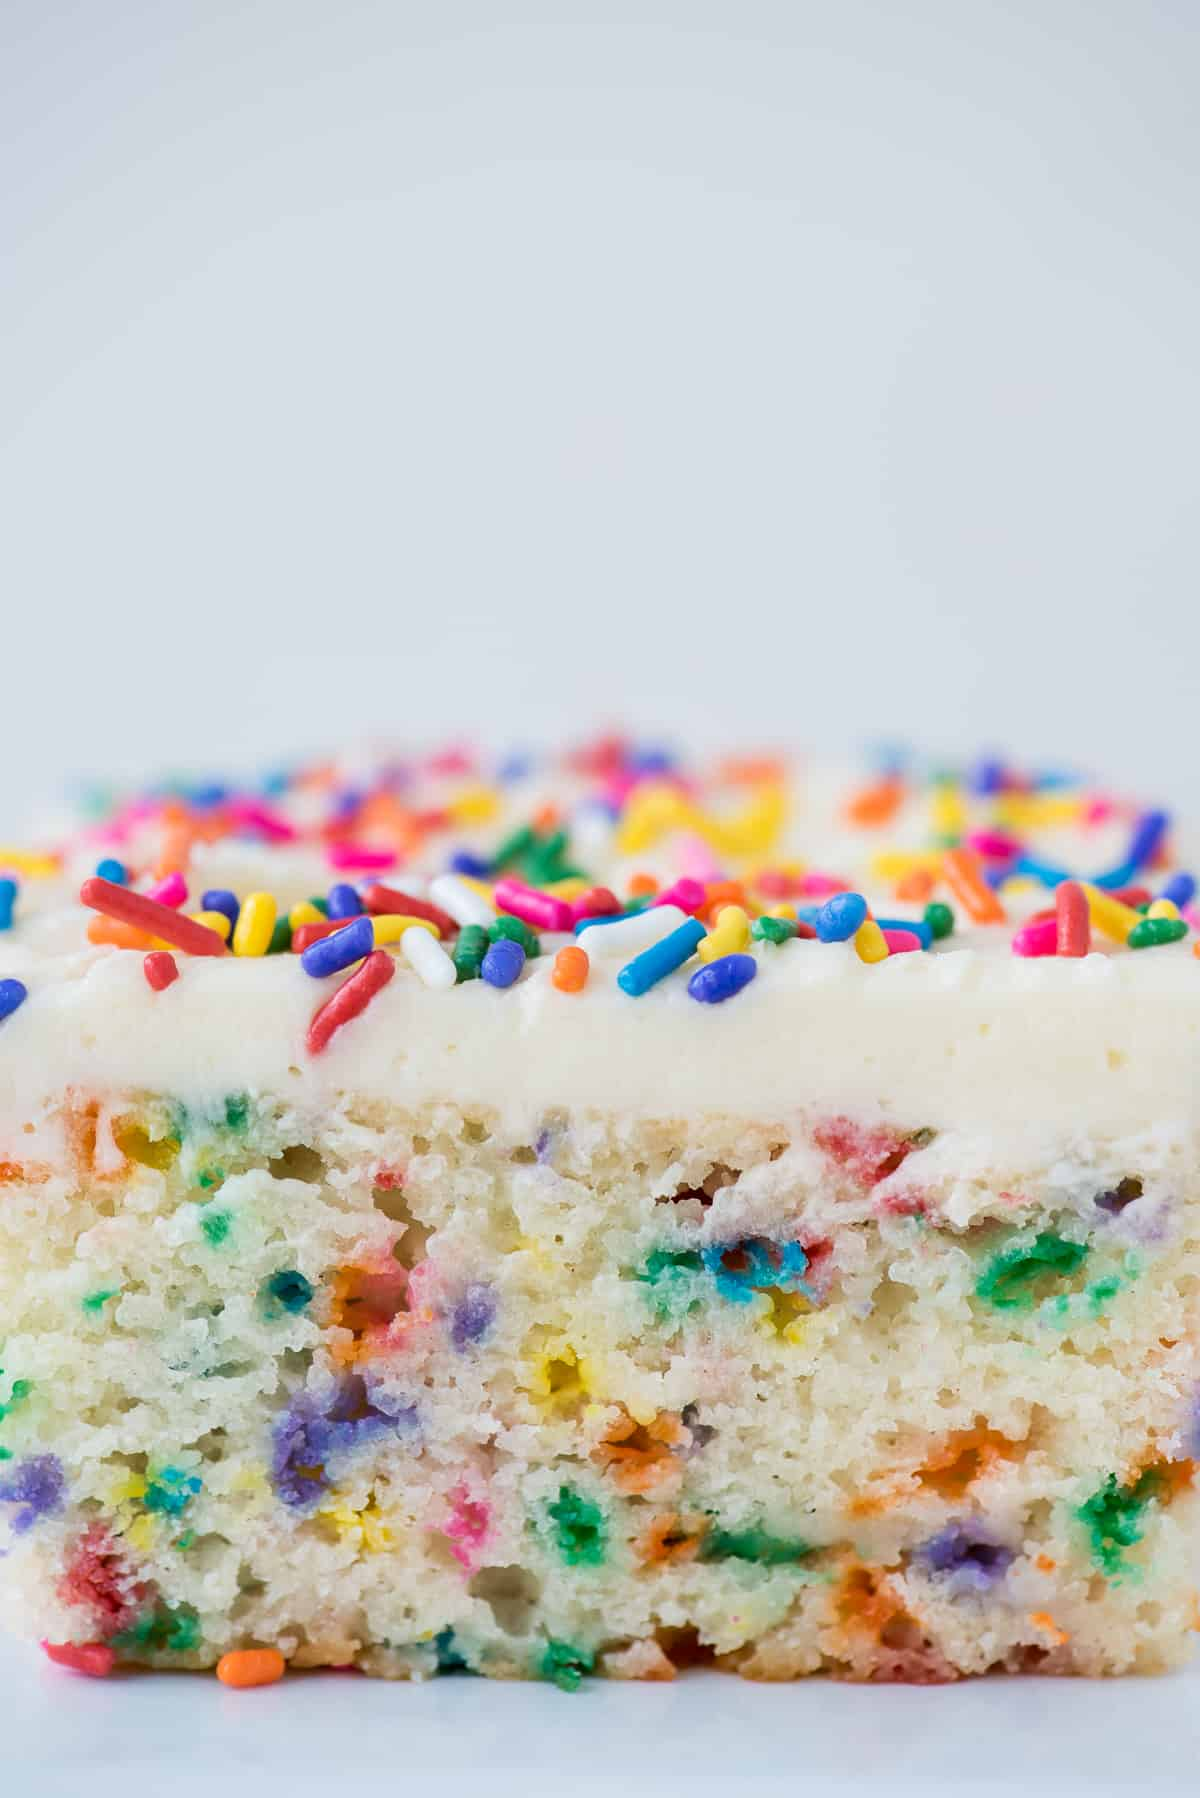 close up image of a slice of funfetti cake